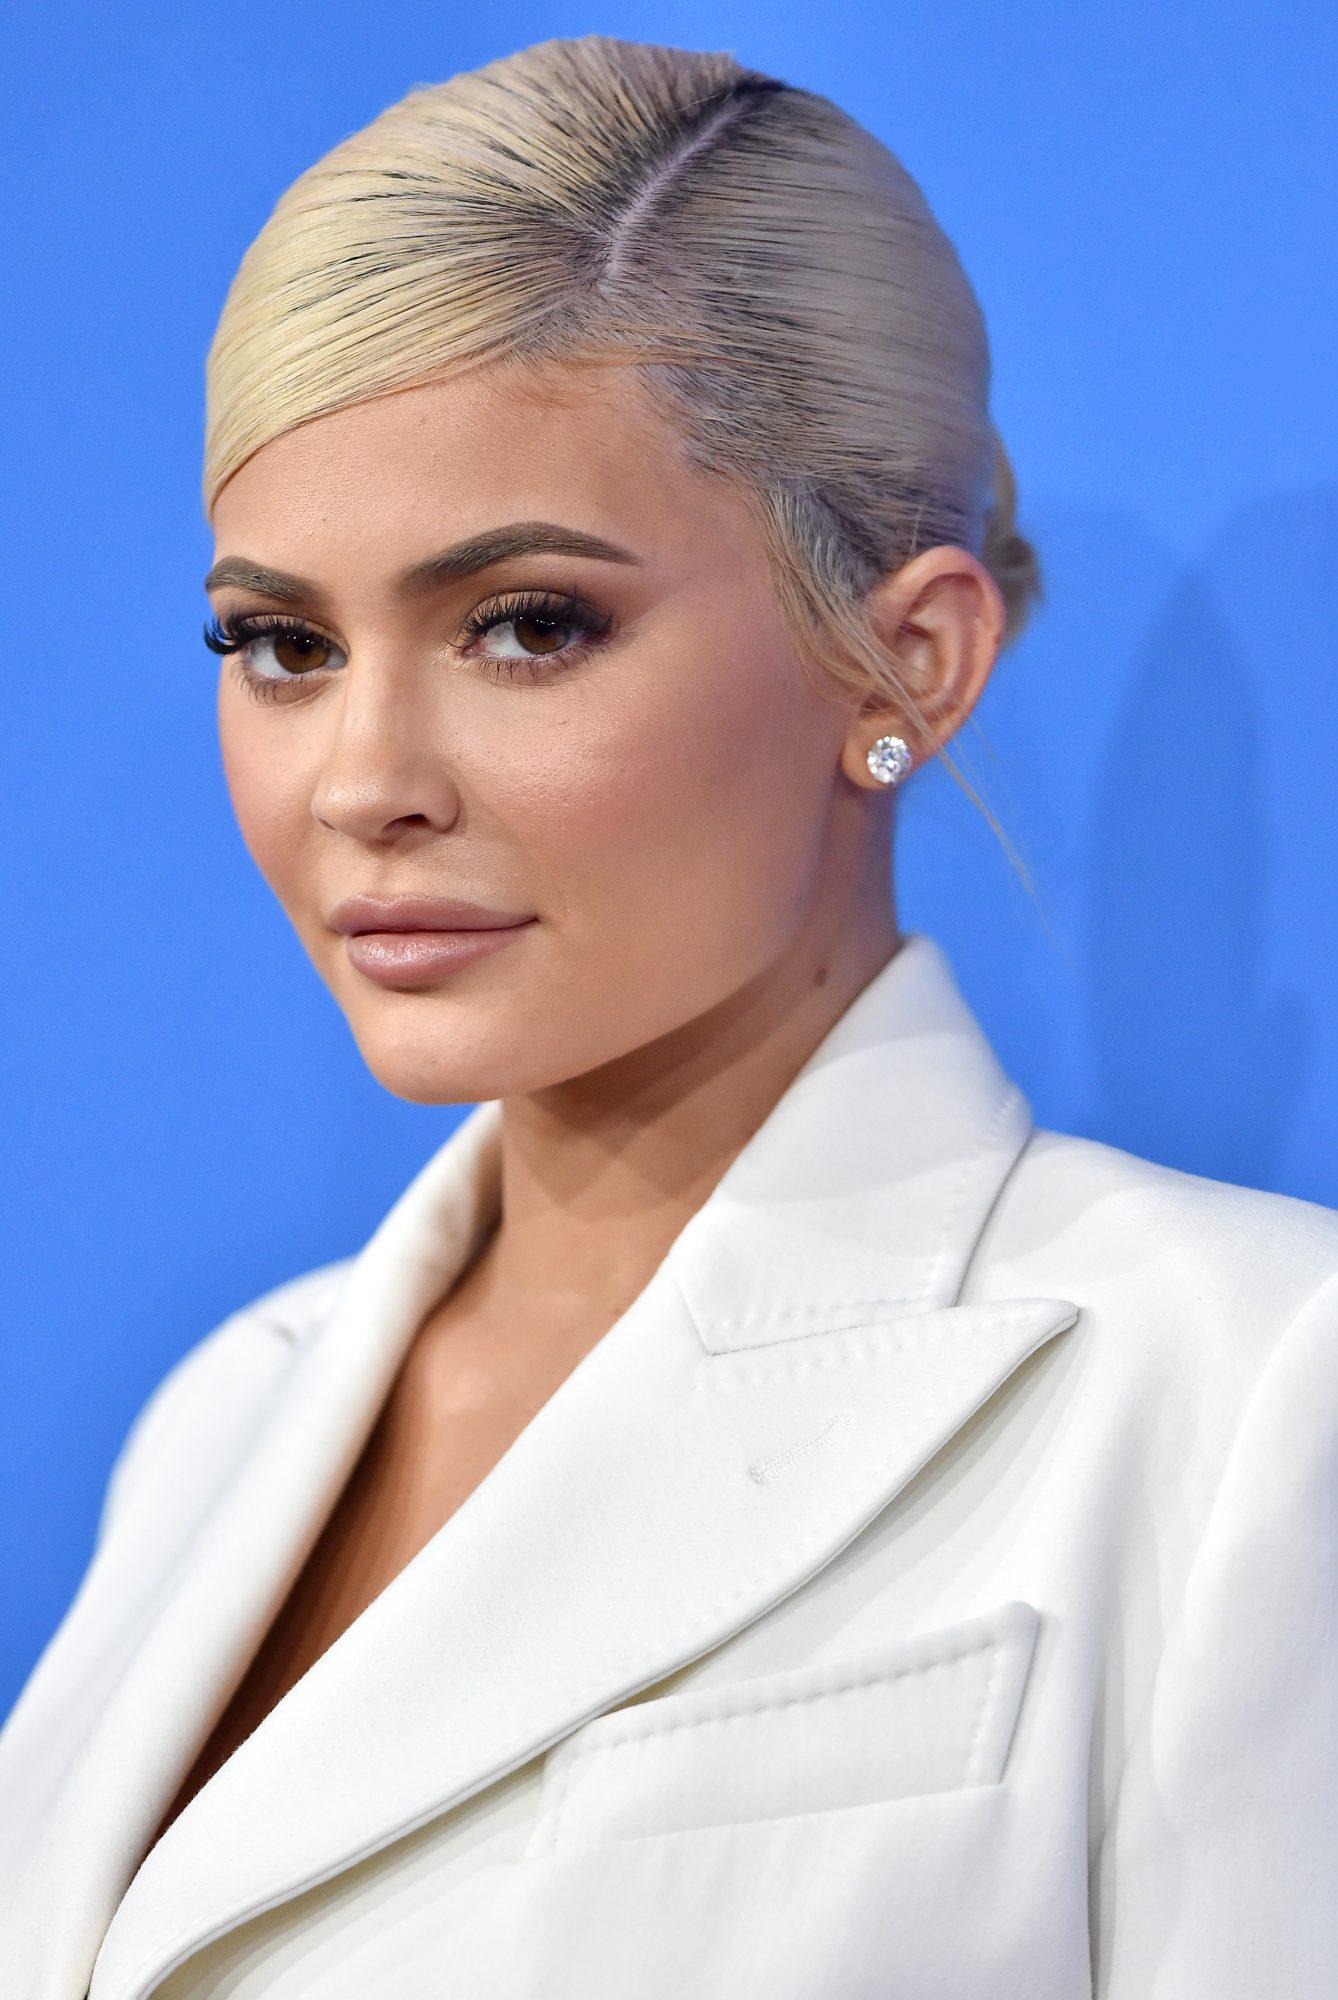 Kylie Jenner earrings